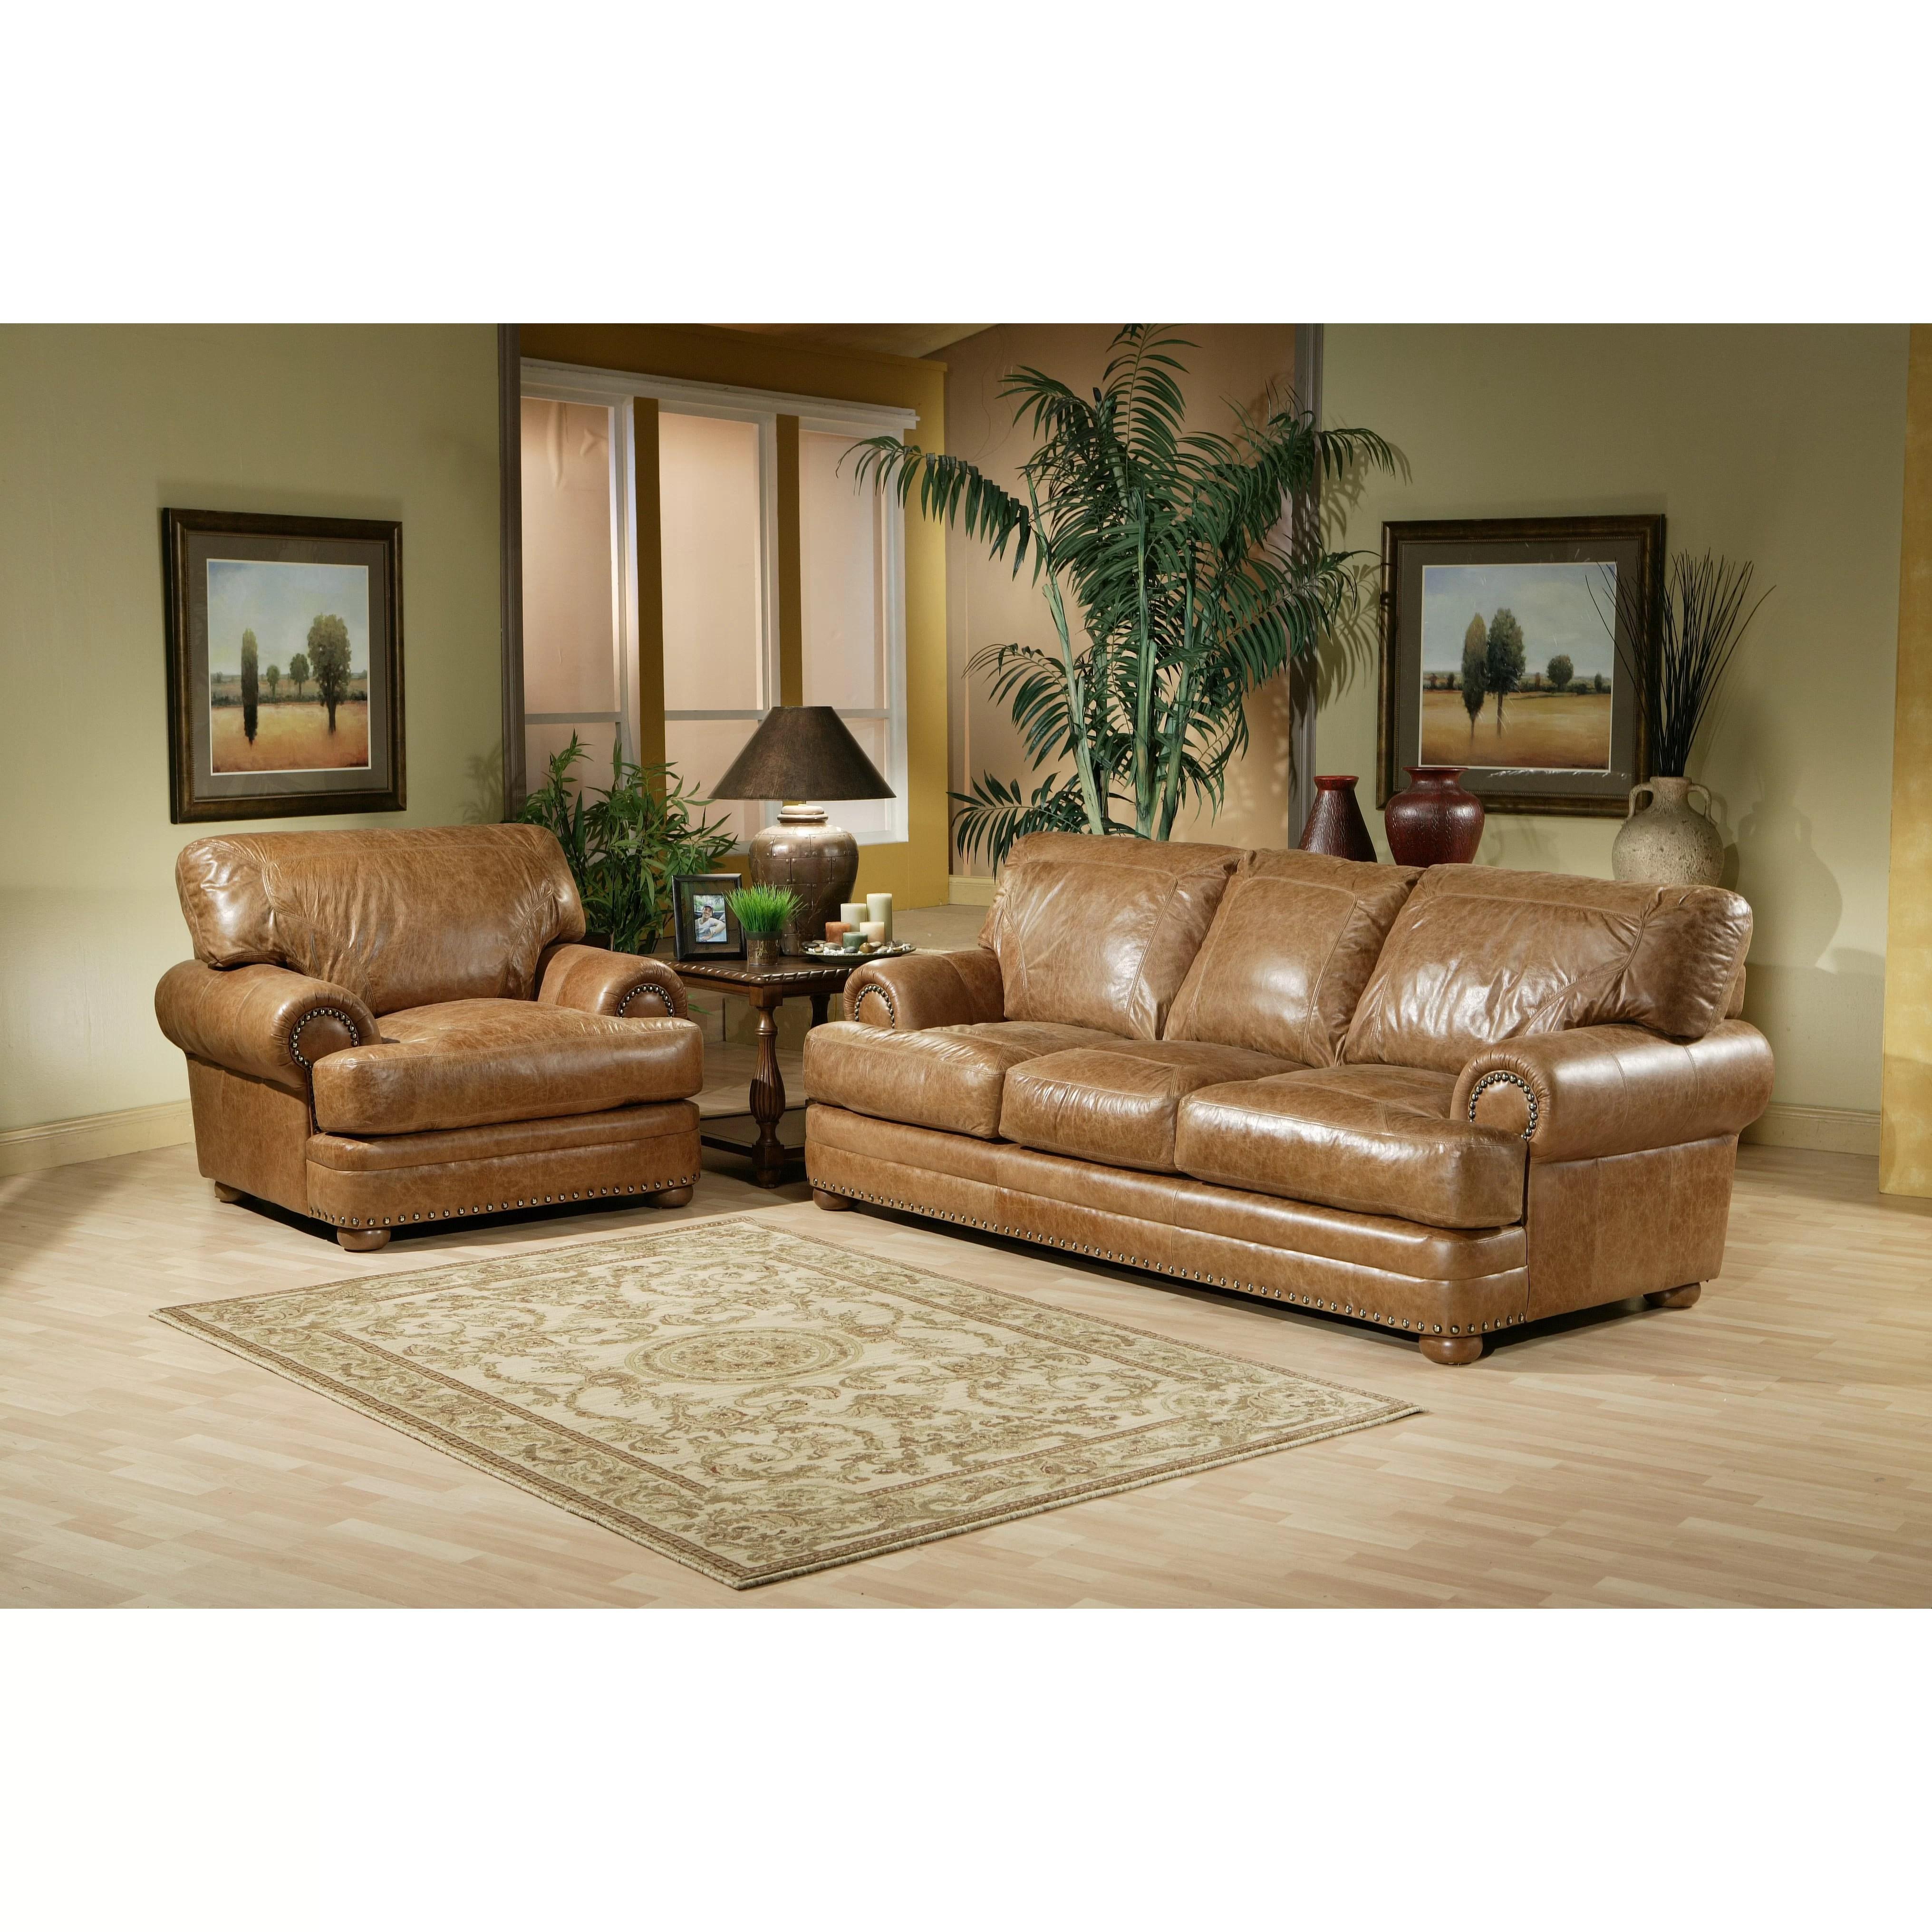 Omnia Leather Houston Leather Living Room Set  Reviews  Wayfair